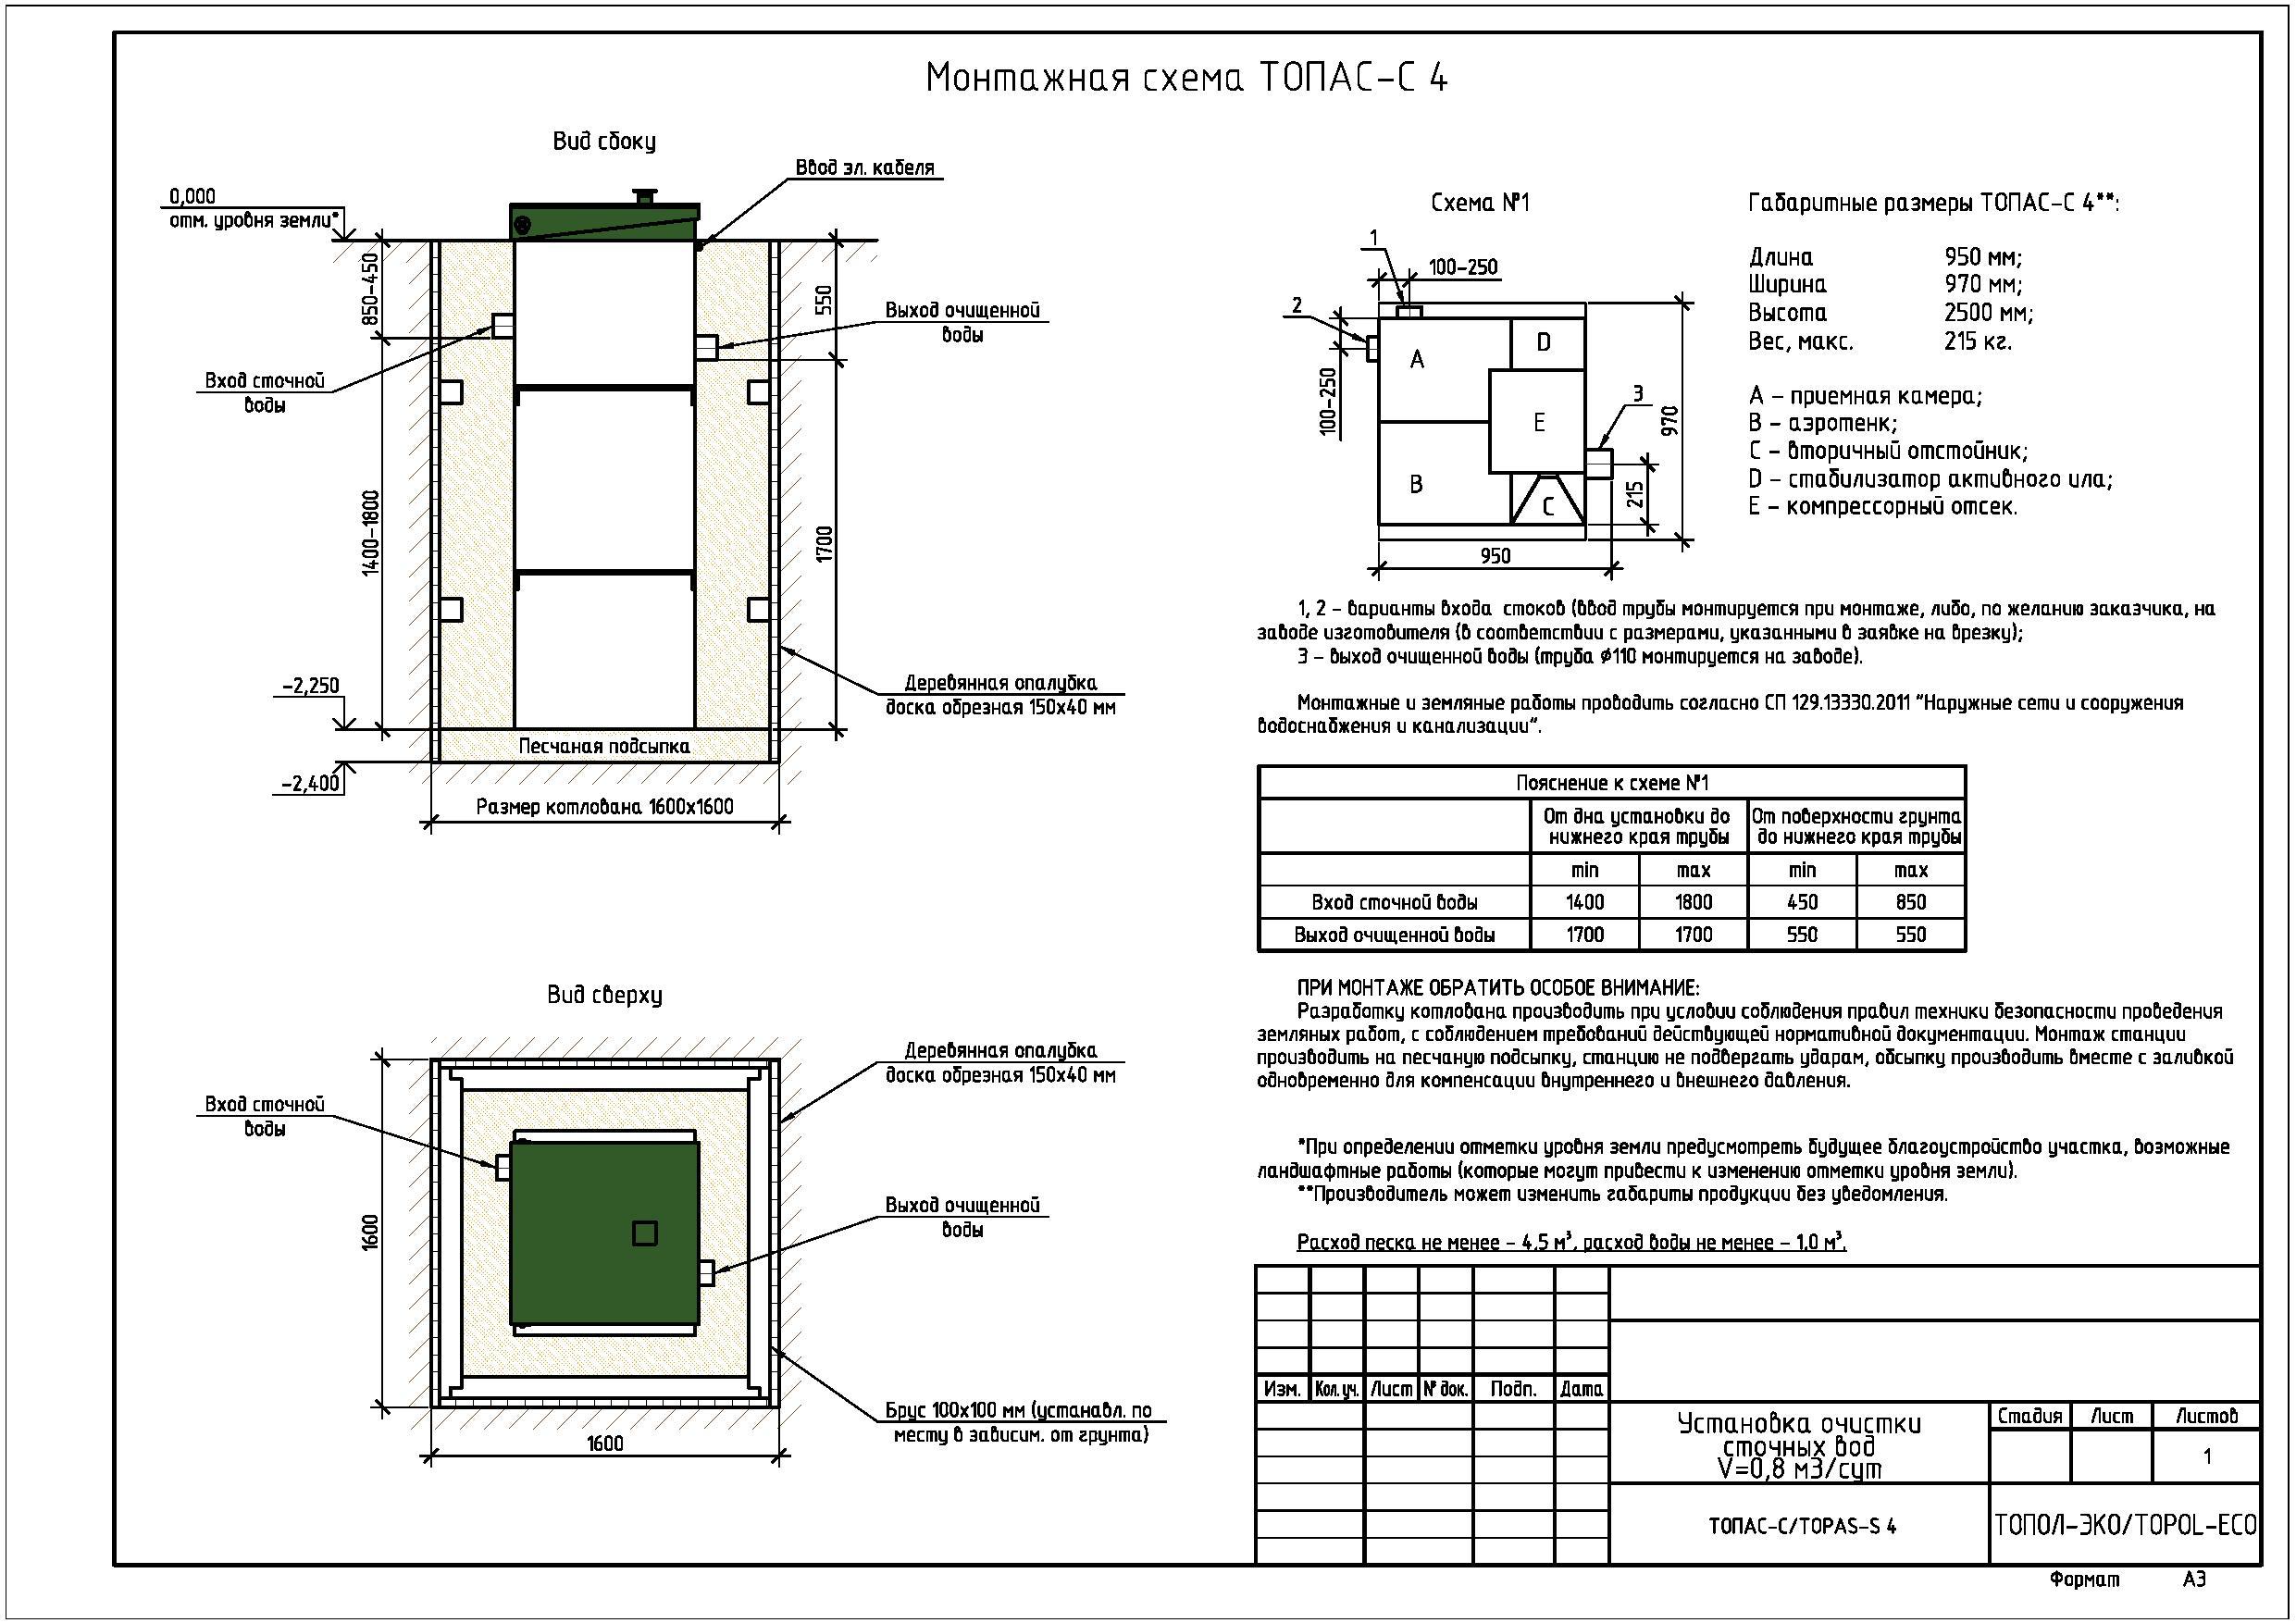 Схема (чертеж) станции Топас 4